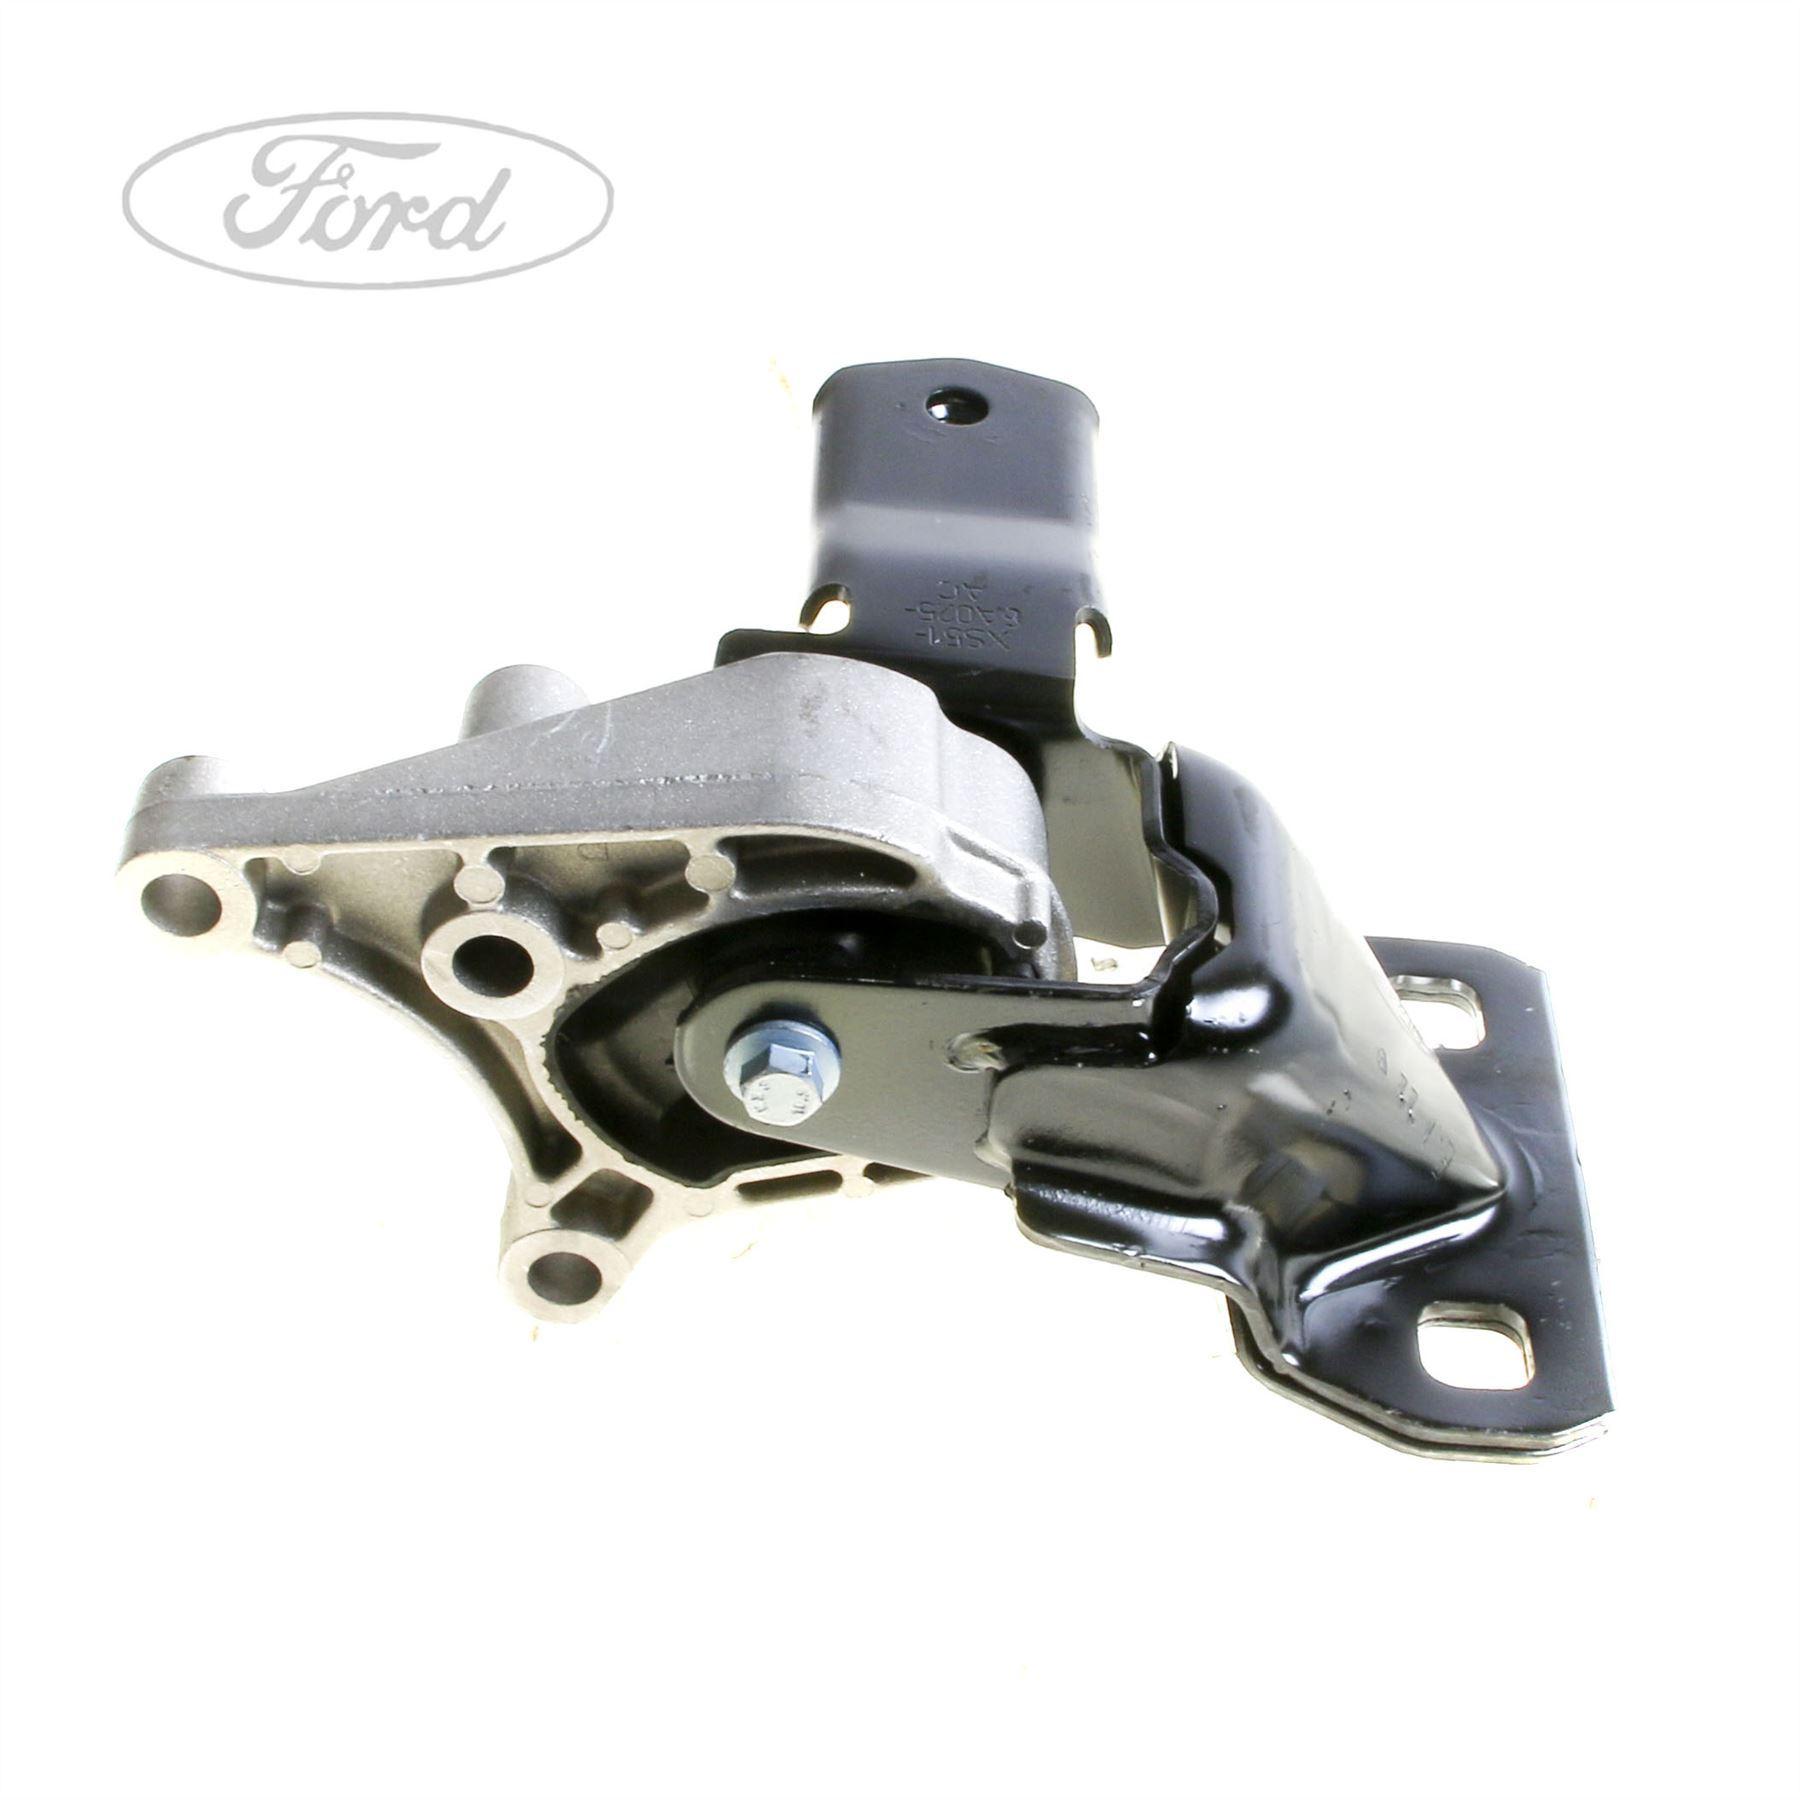 Genuine Ford Ka Mk 1 Transmission Box Mount Bracket 1217187 Ebay Fuse Numbers